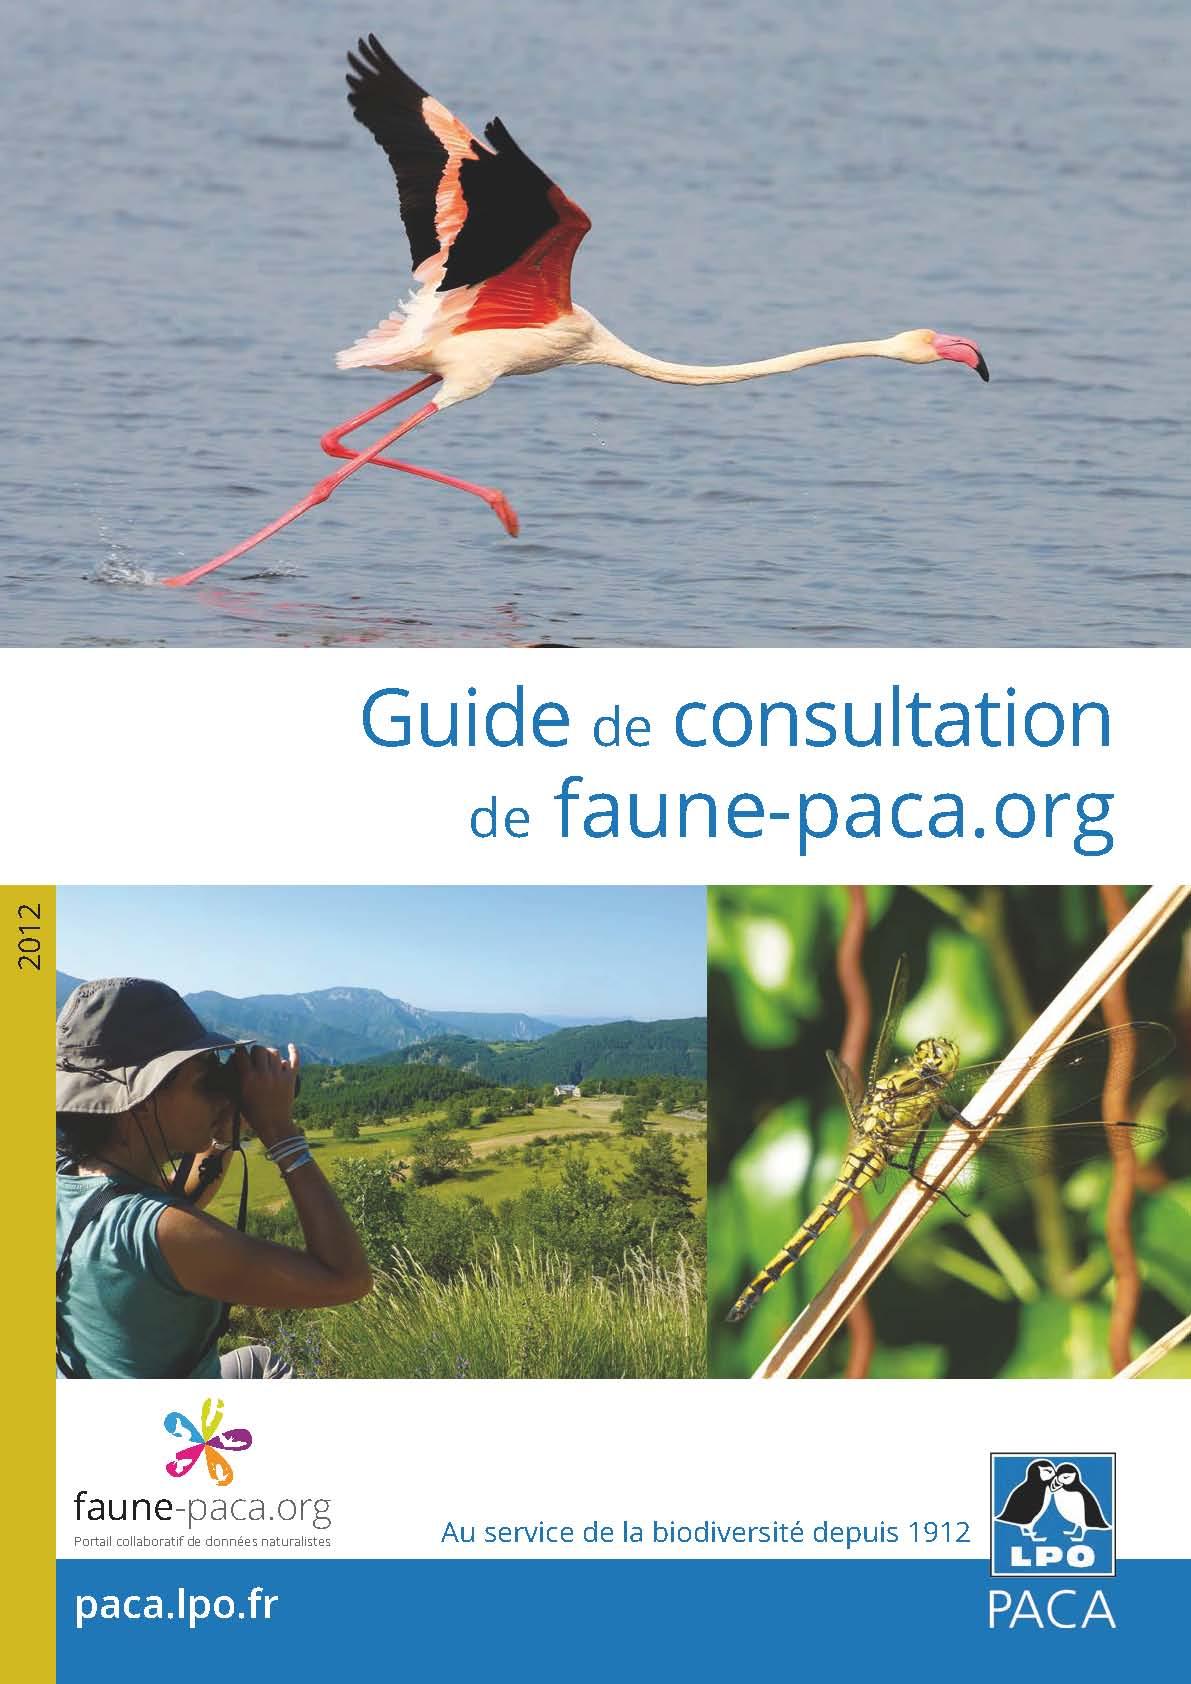 https://cdnfiles1.biolovision.net/www.faune-paca.org/userfiles/guideconsultationfaunepacaVFPage01.jpg